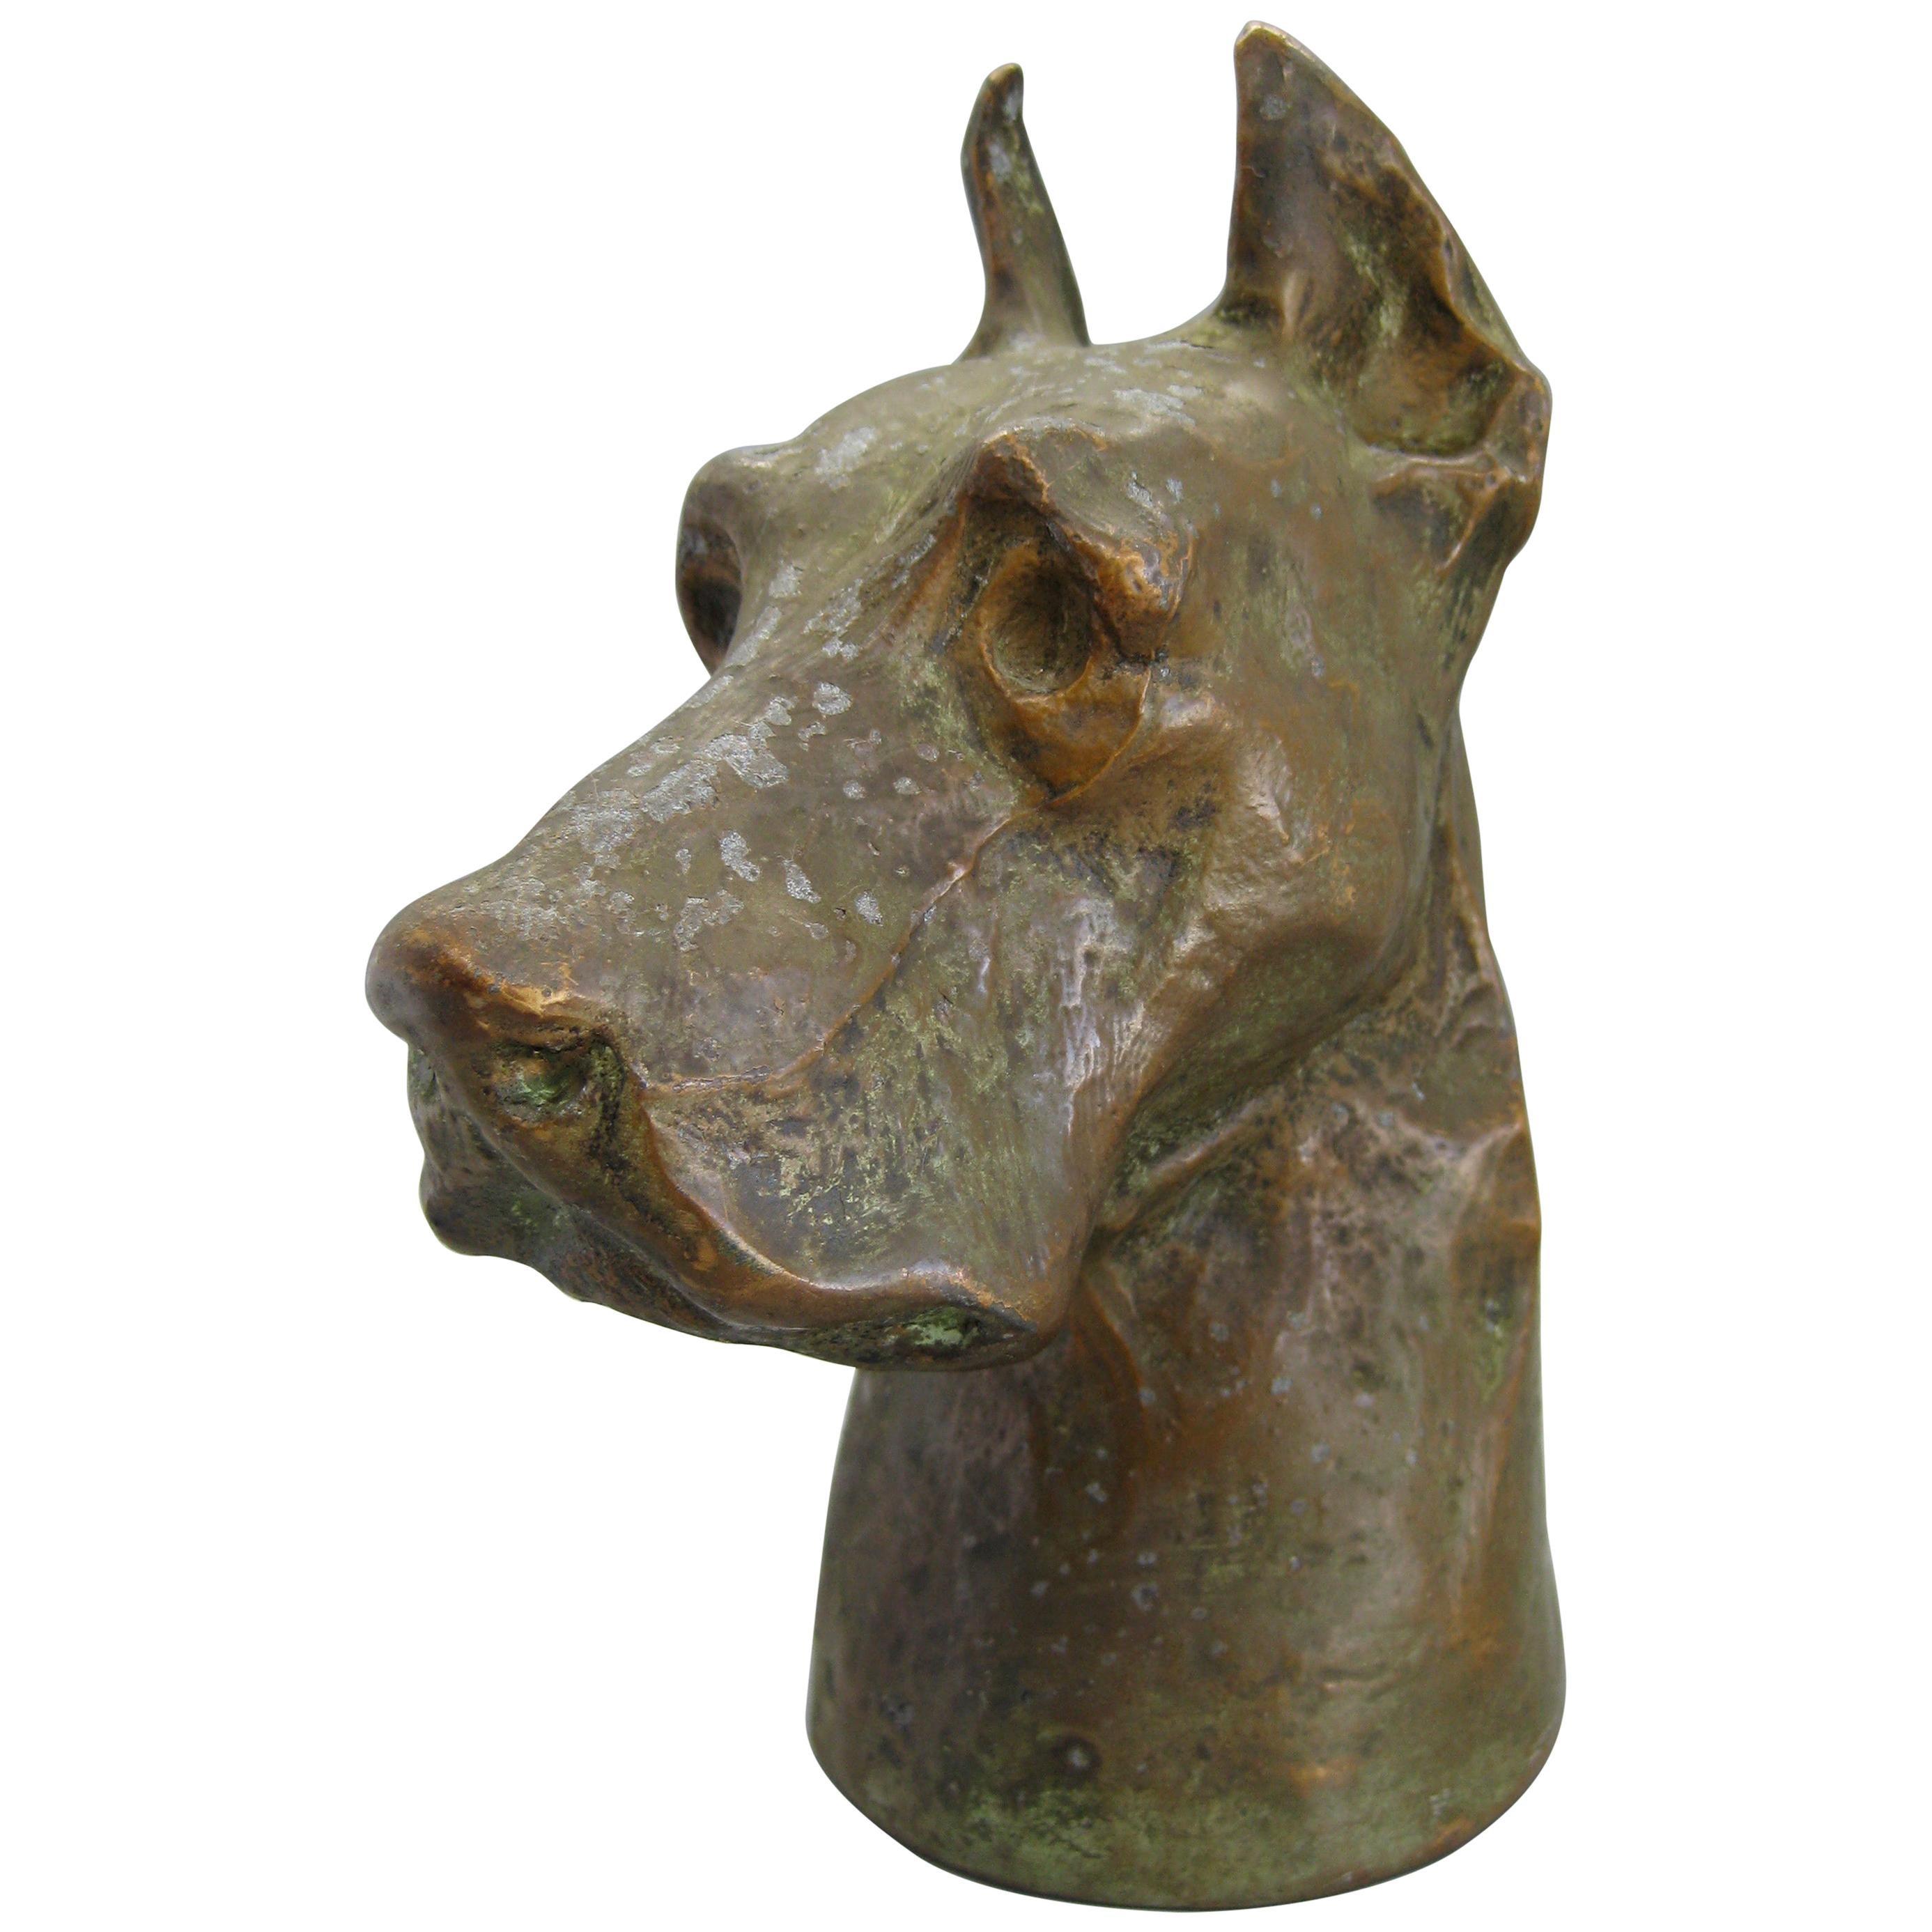 Antique McClelland Barclay Doberman Pinscher Dog Figural Bronze Figure Sculpture